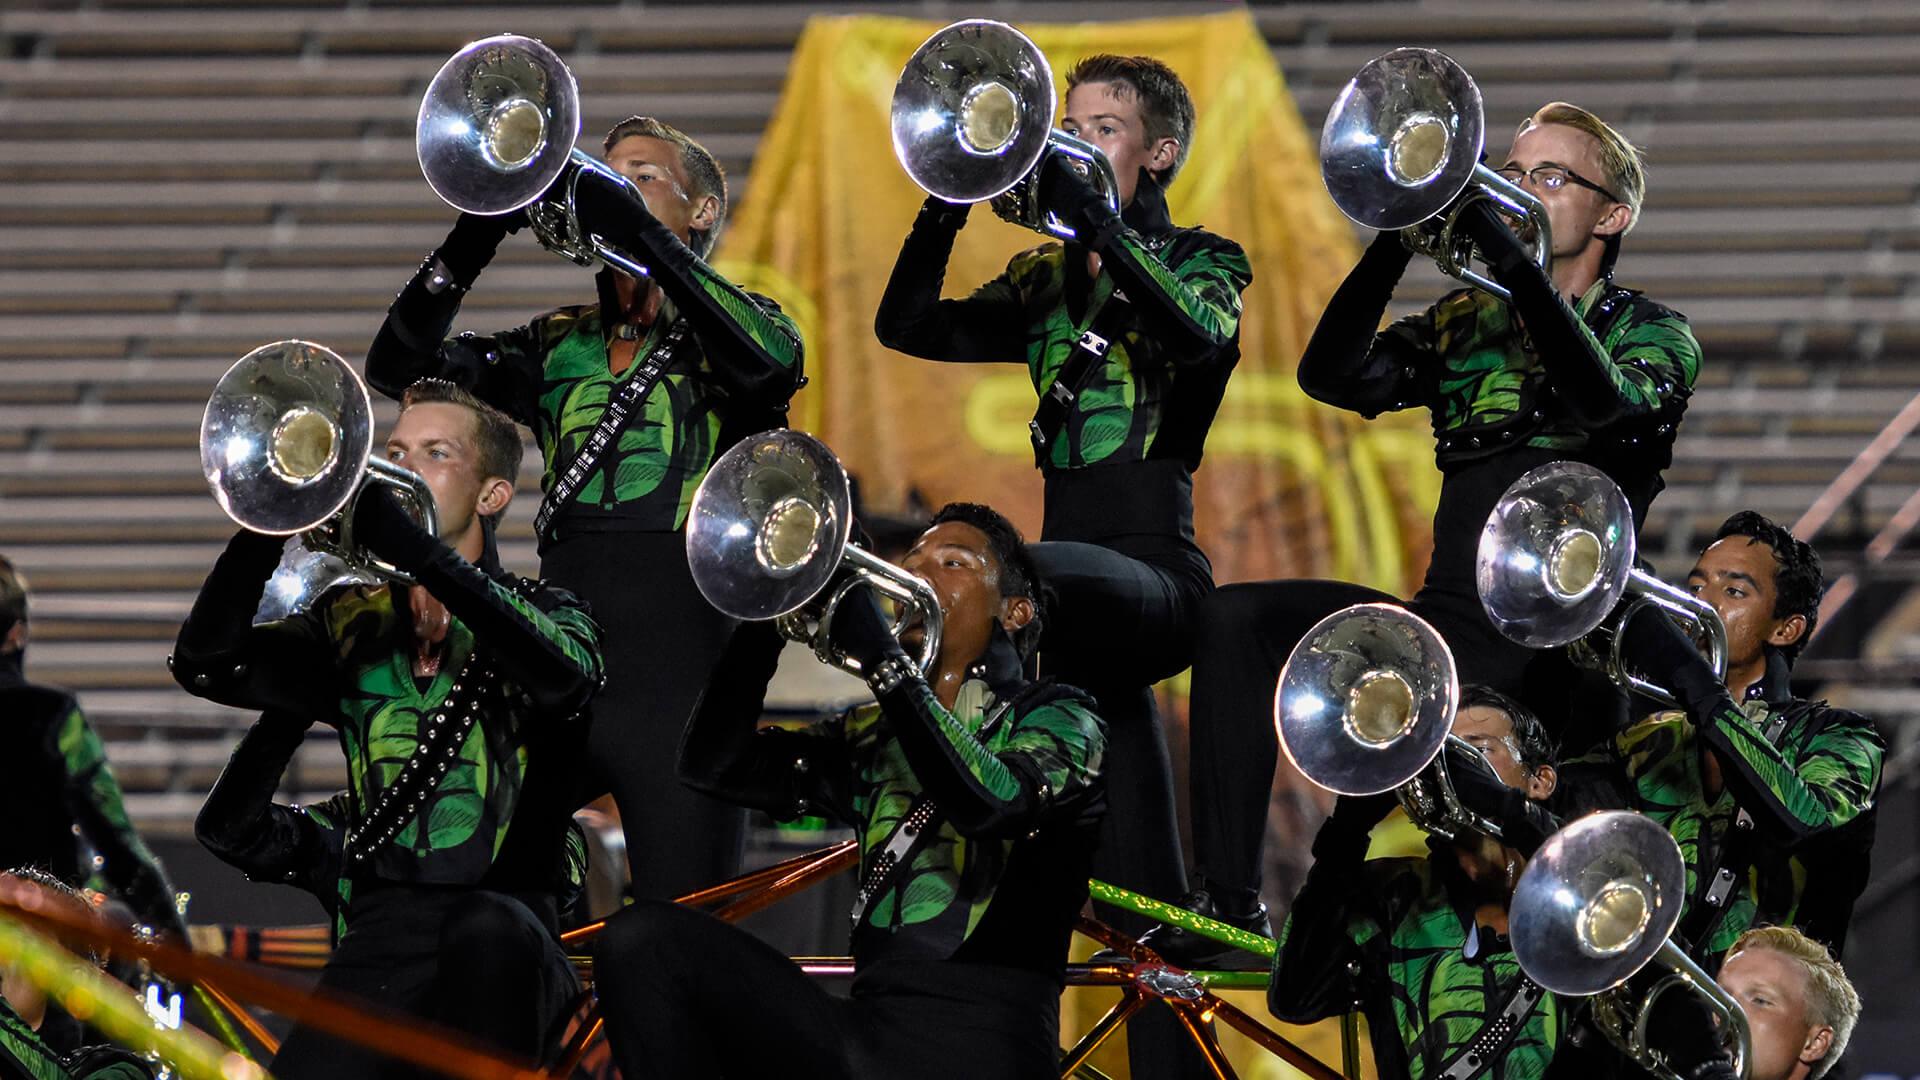 Cavalcade of Brass